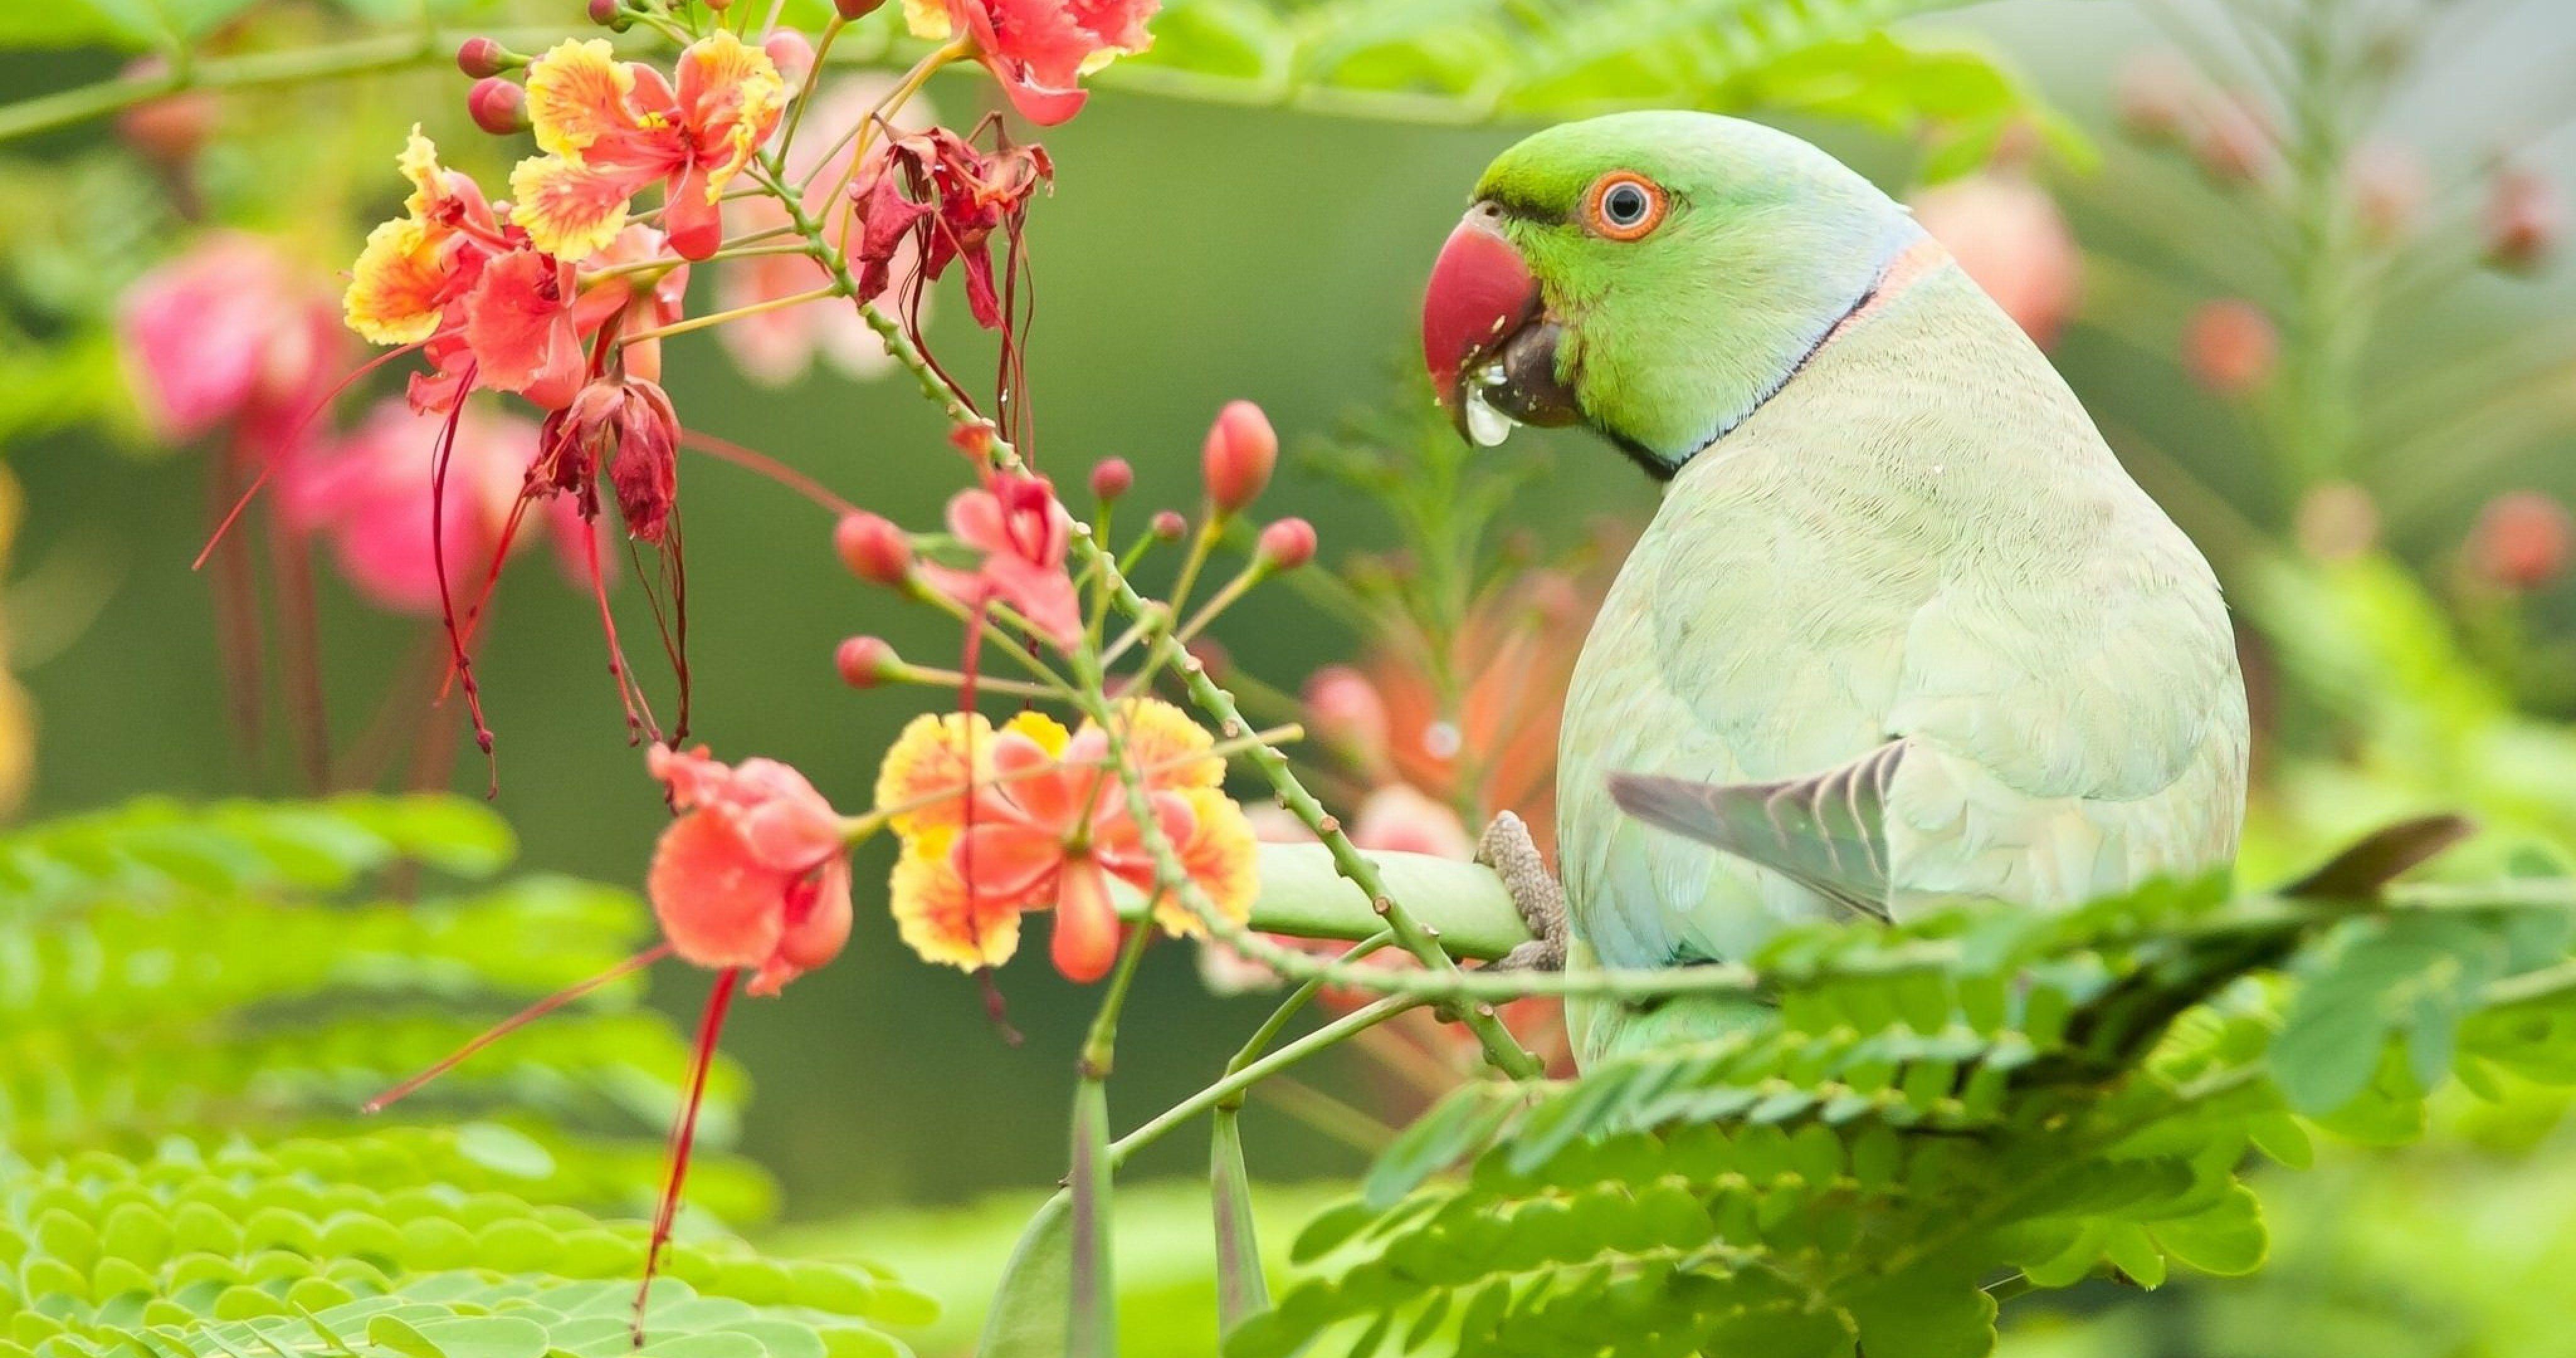 indian ringed parrot 4k ultra hd wallpaper   Adobe